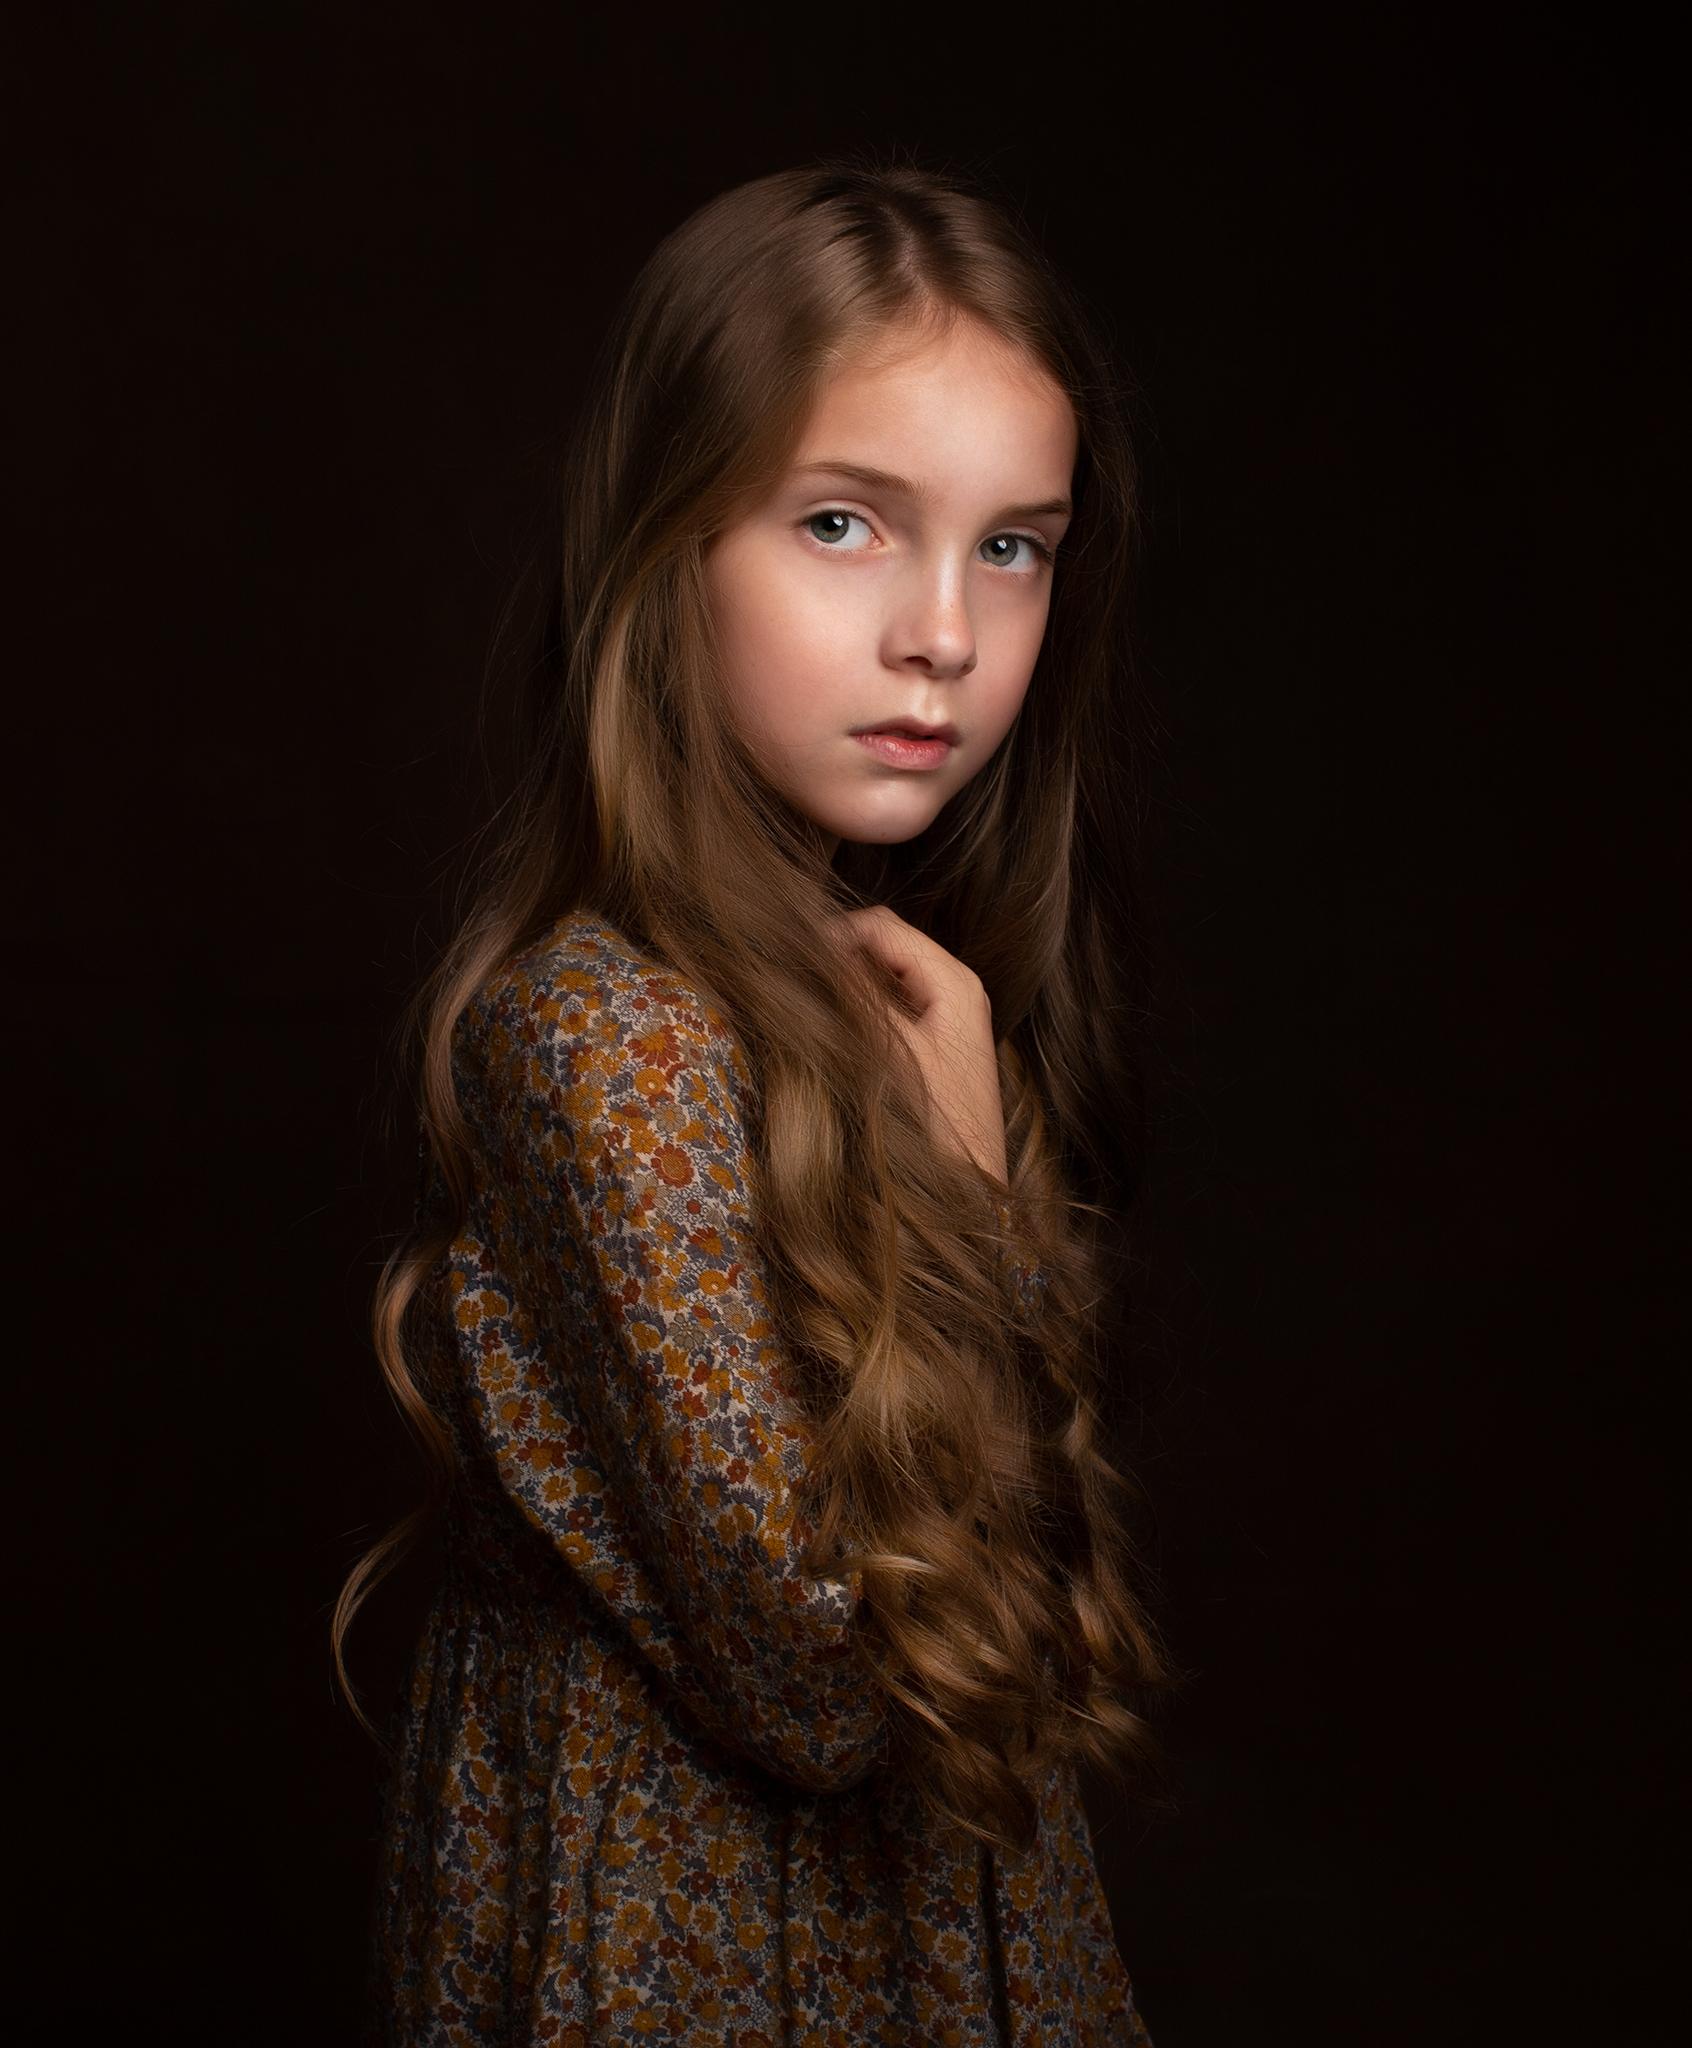 elizabethg_fineart_portrait_photography_eva_005.jpg